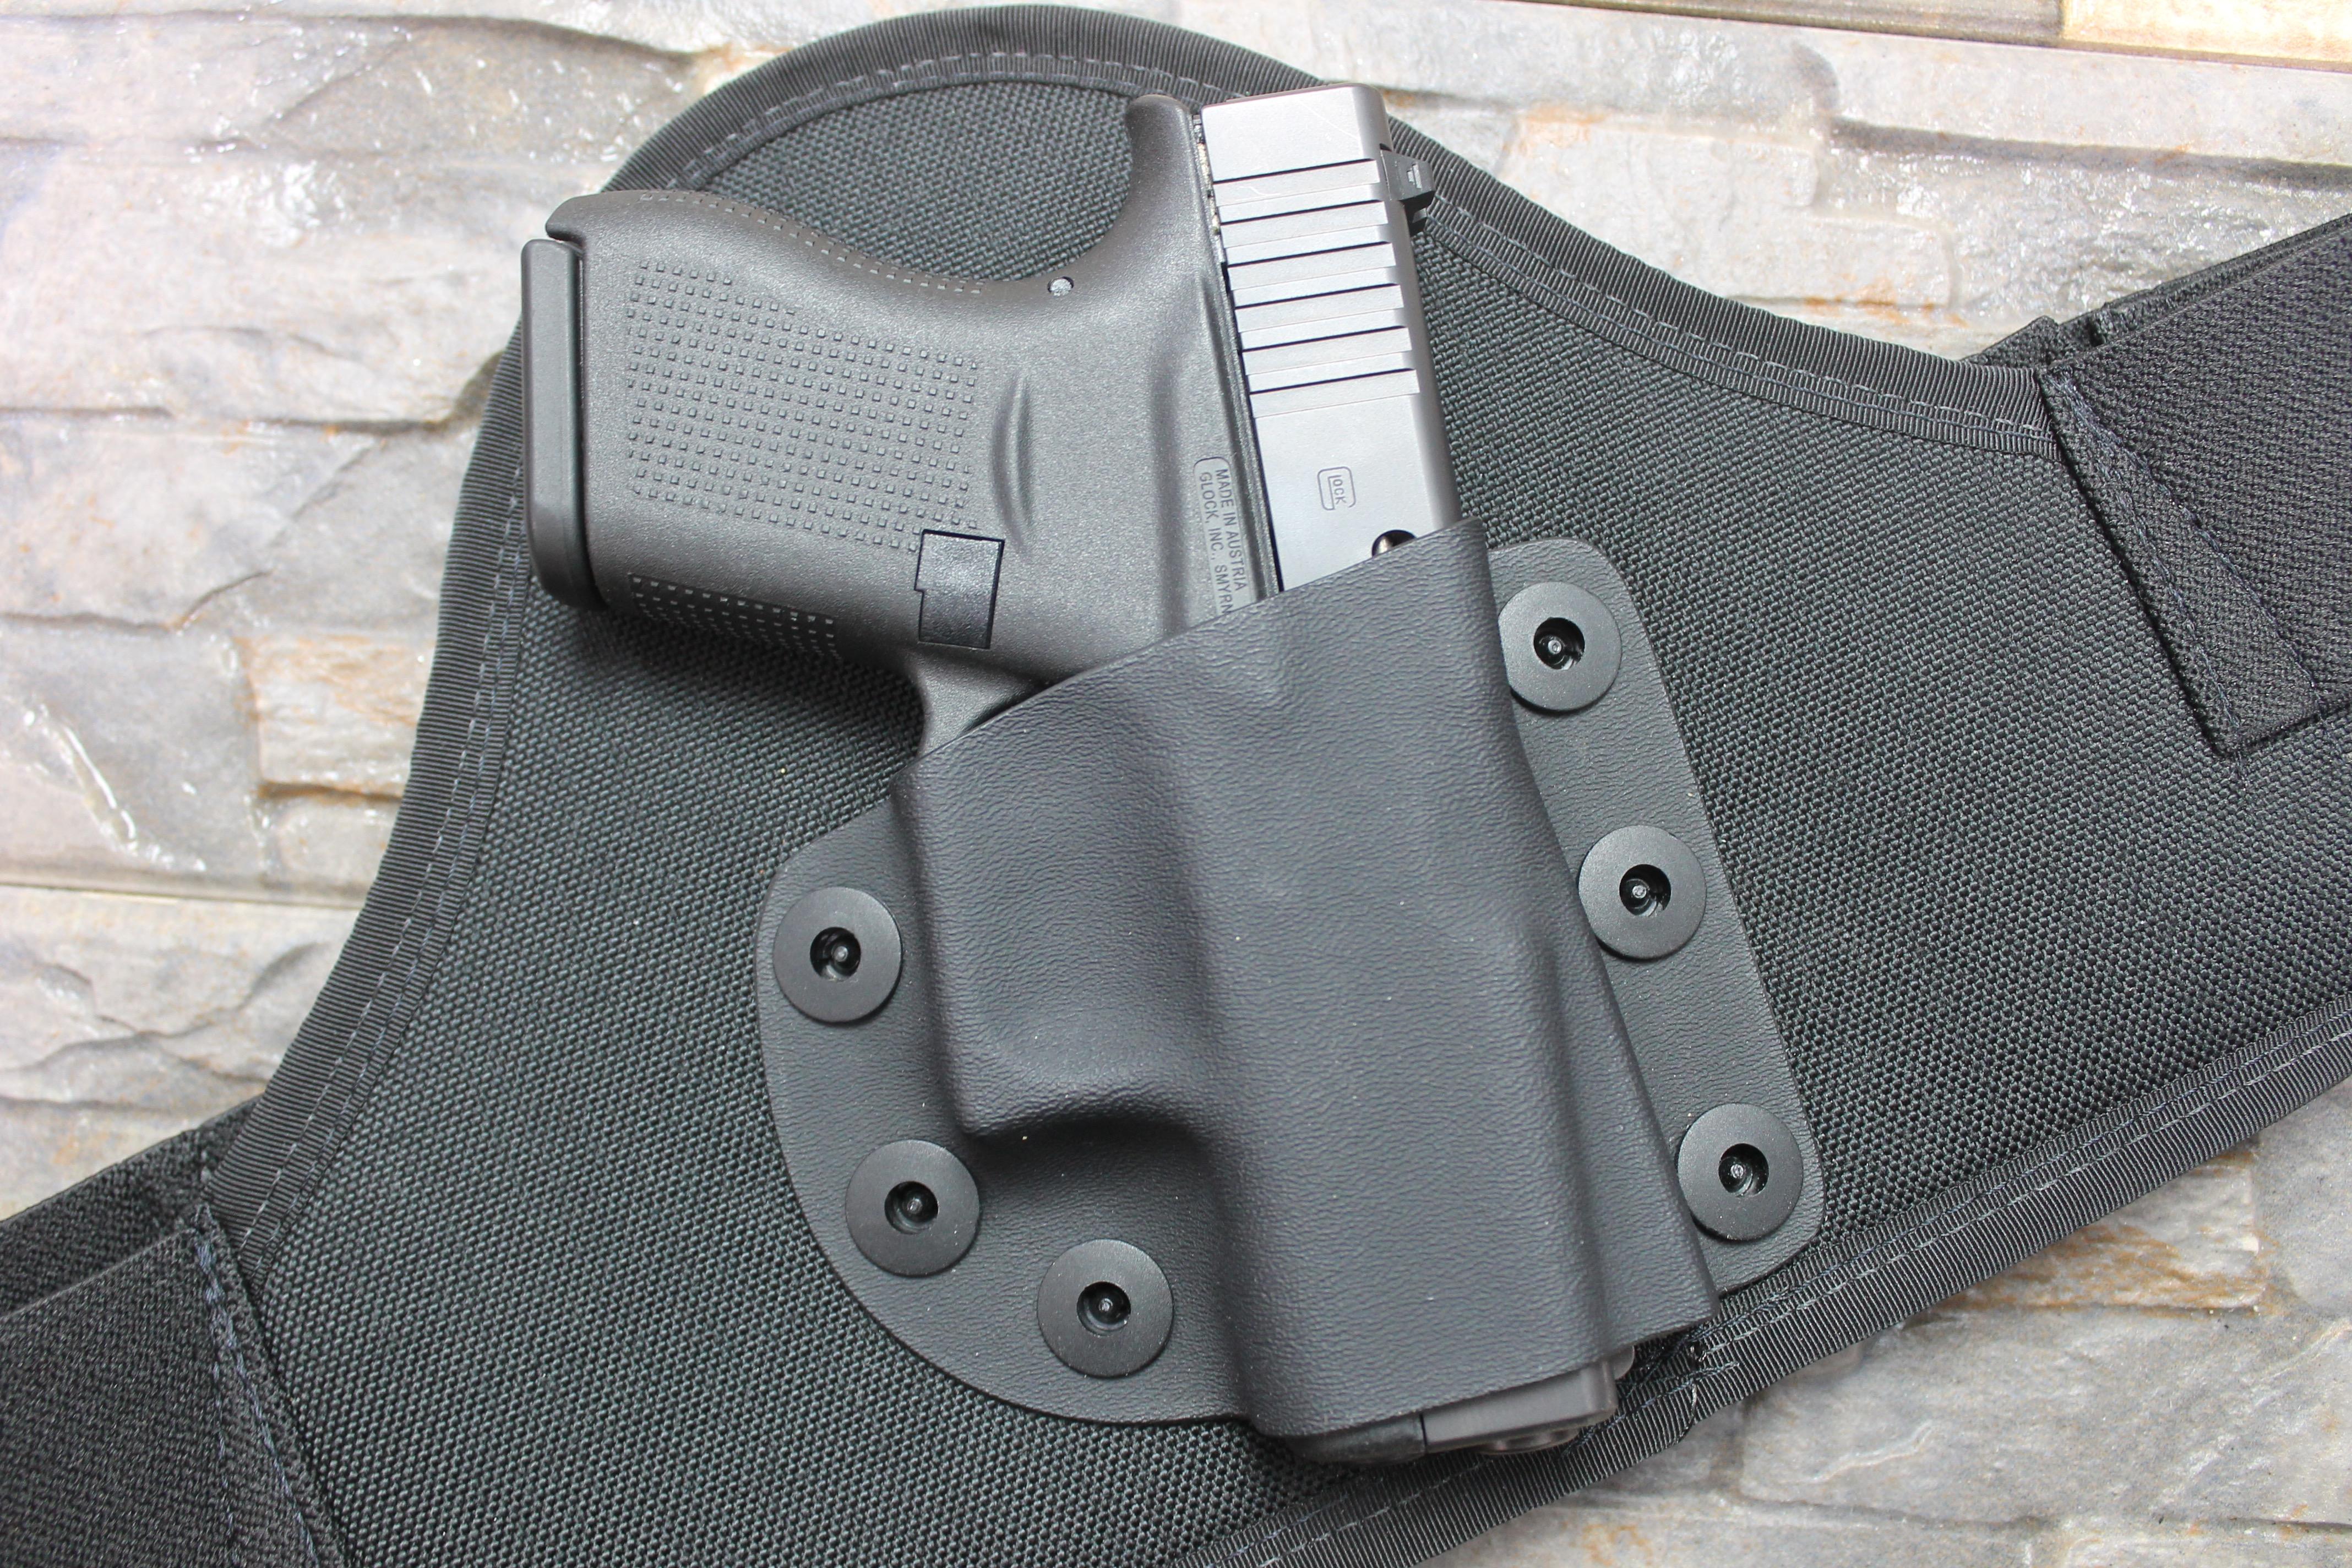 Glock 43 Concealed Carry Handgun Review - TactiPac - Tactical